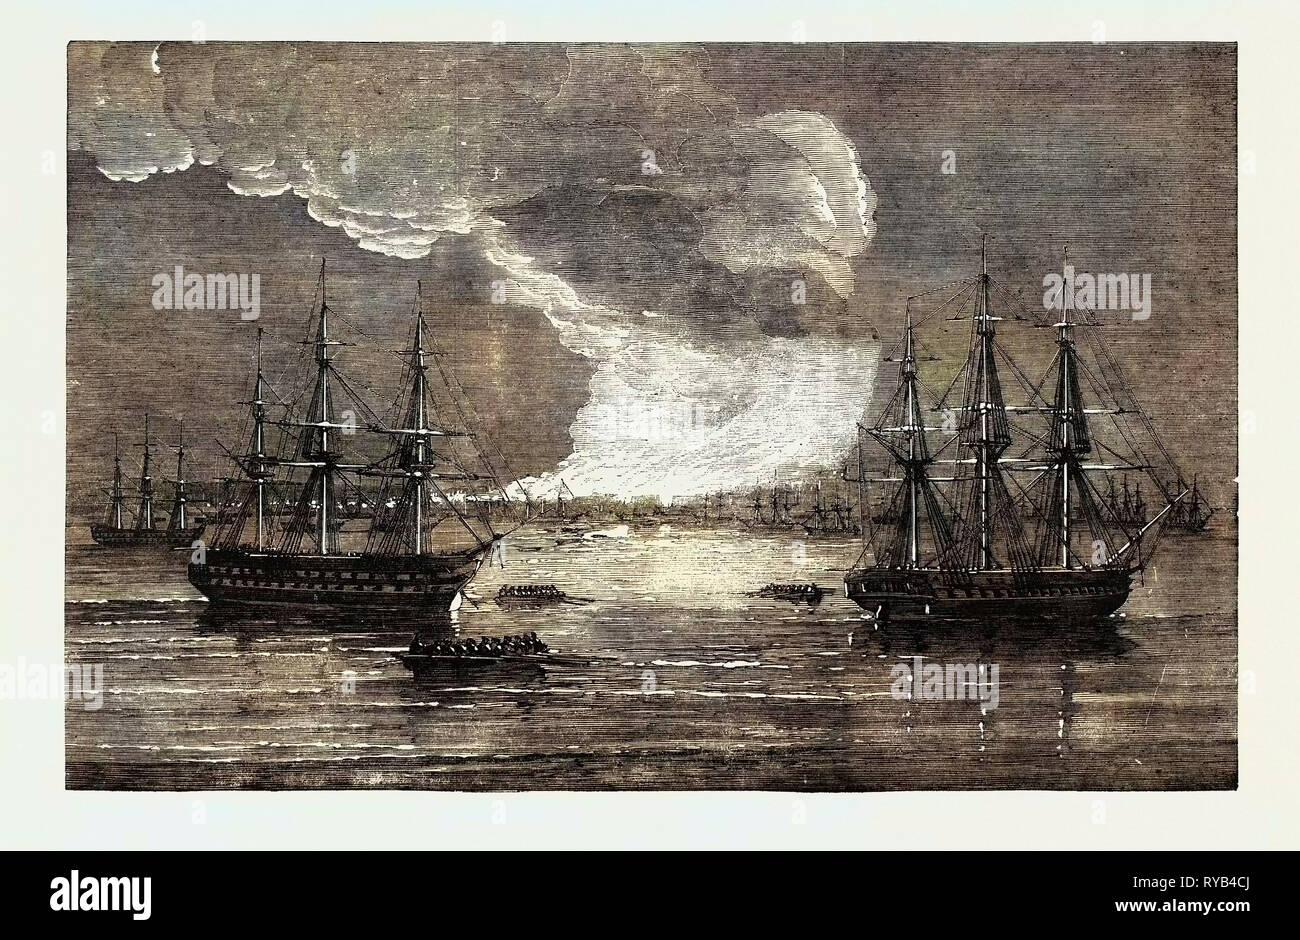 Conflagration at Varna 1854 - Stock Image